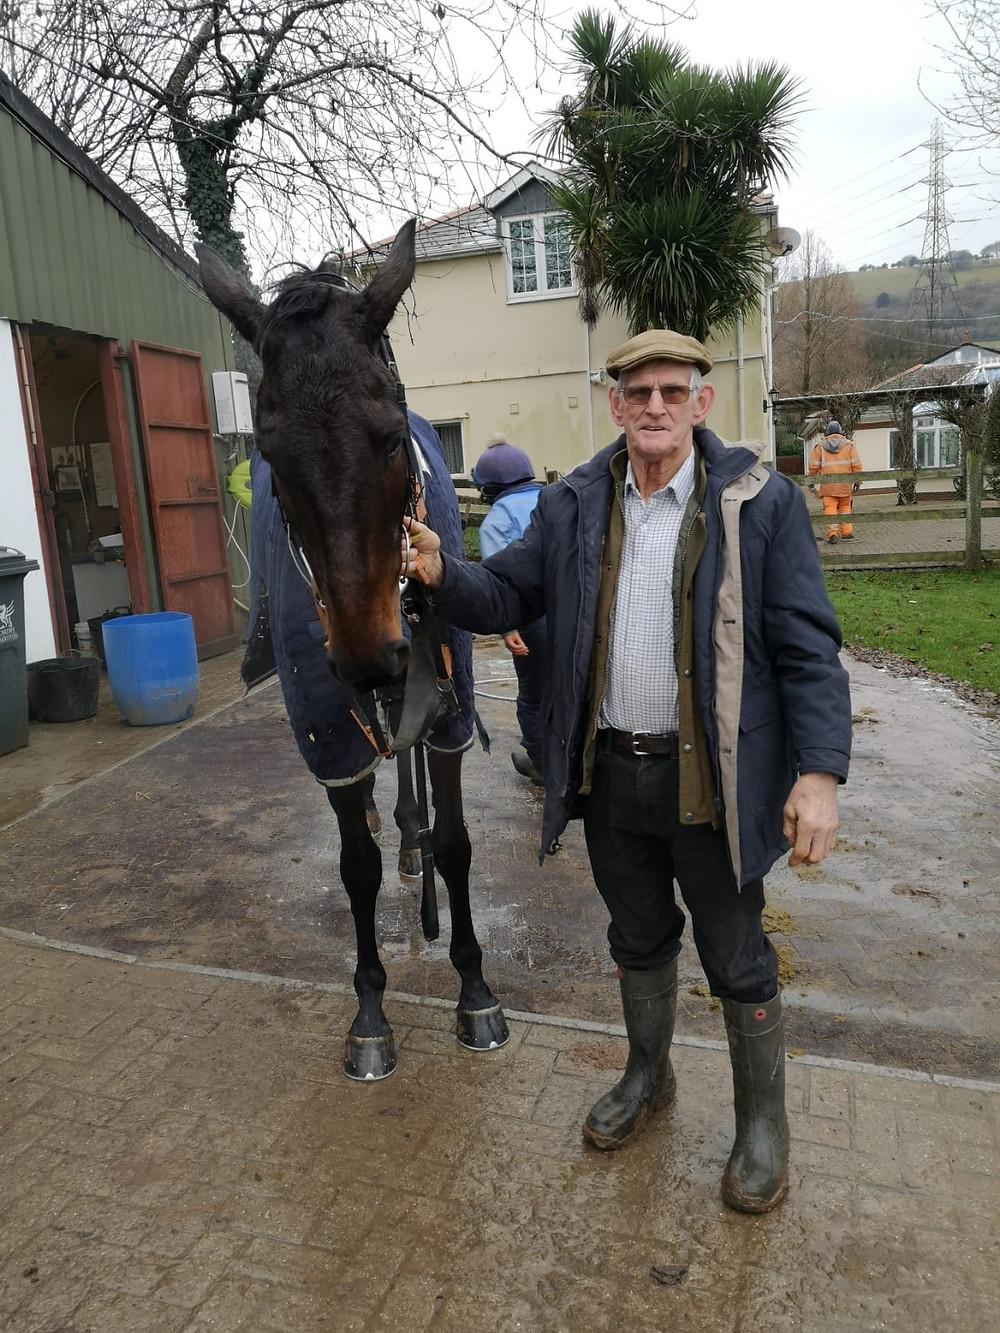 Iwilldoit with his breeder Stan